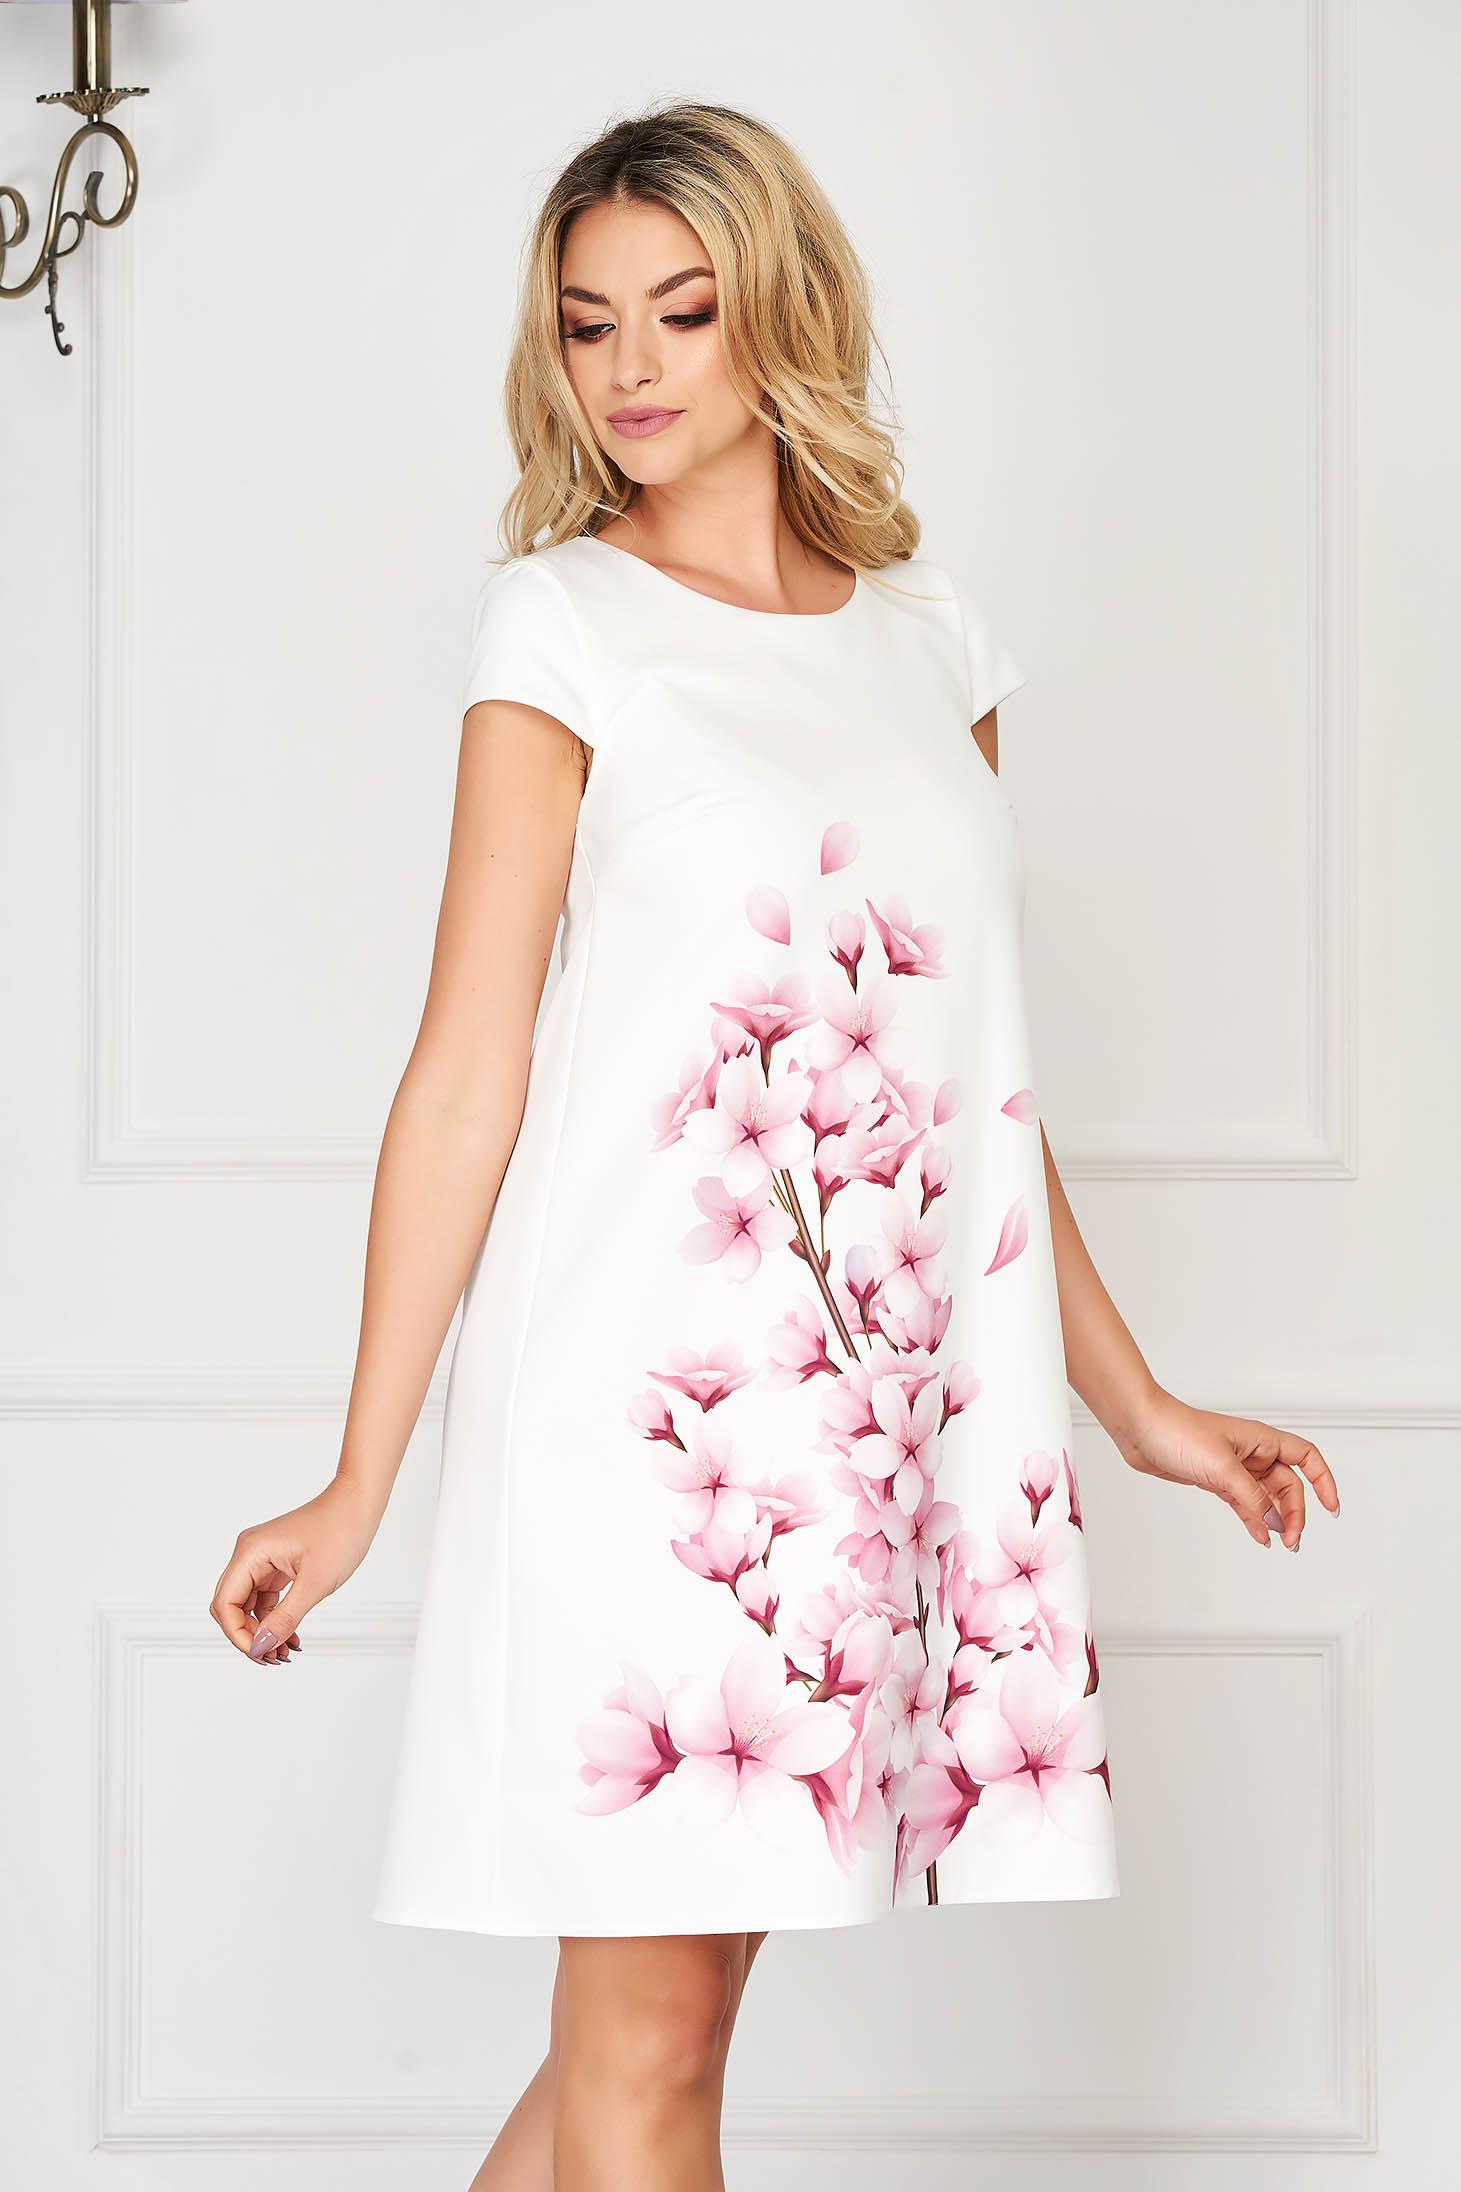 Dress StarShinerS lightpurple elegant short cut cloth slightly elastic fabric with floral print